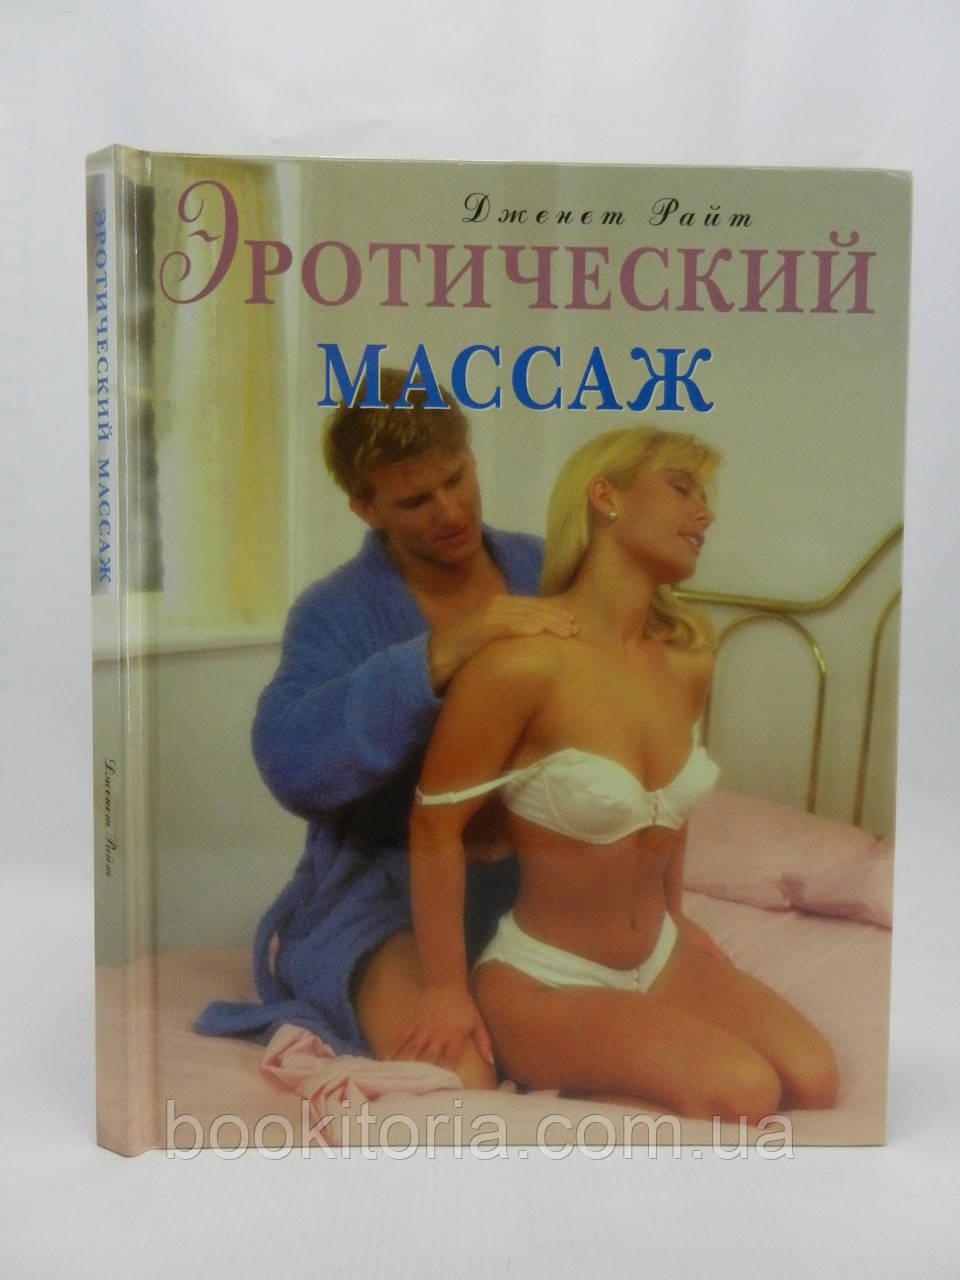 Райт Д. Эротический массаж. Магия тела (б/у).